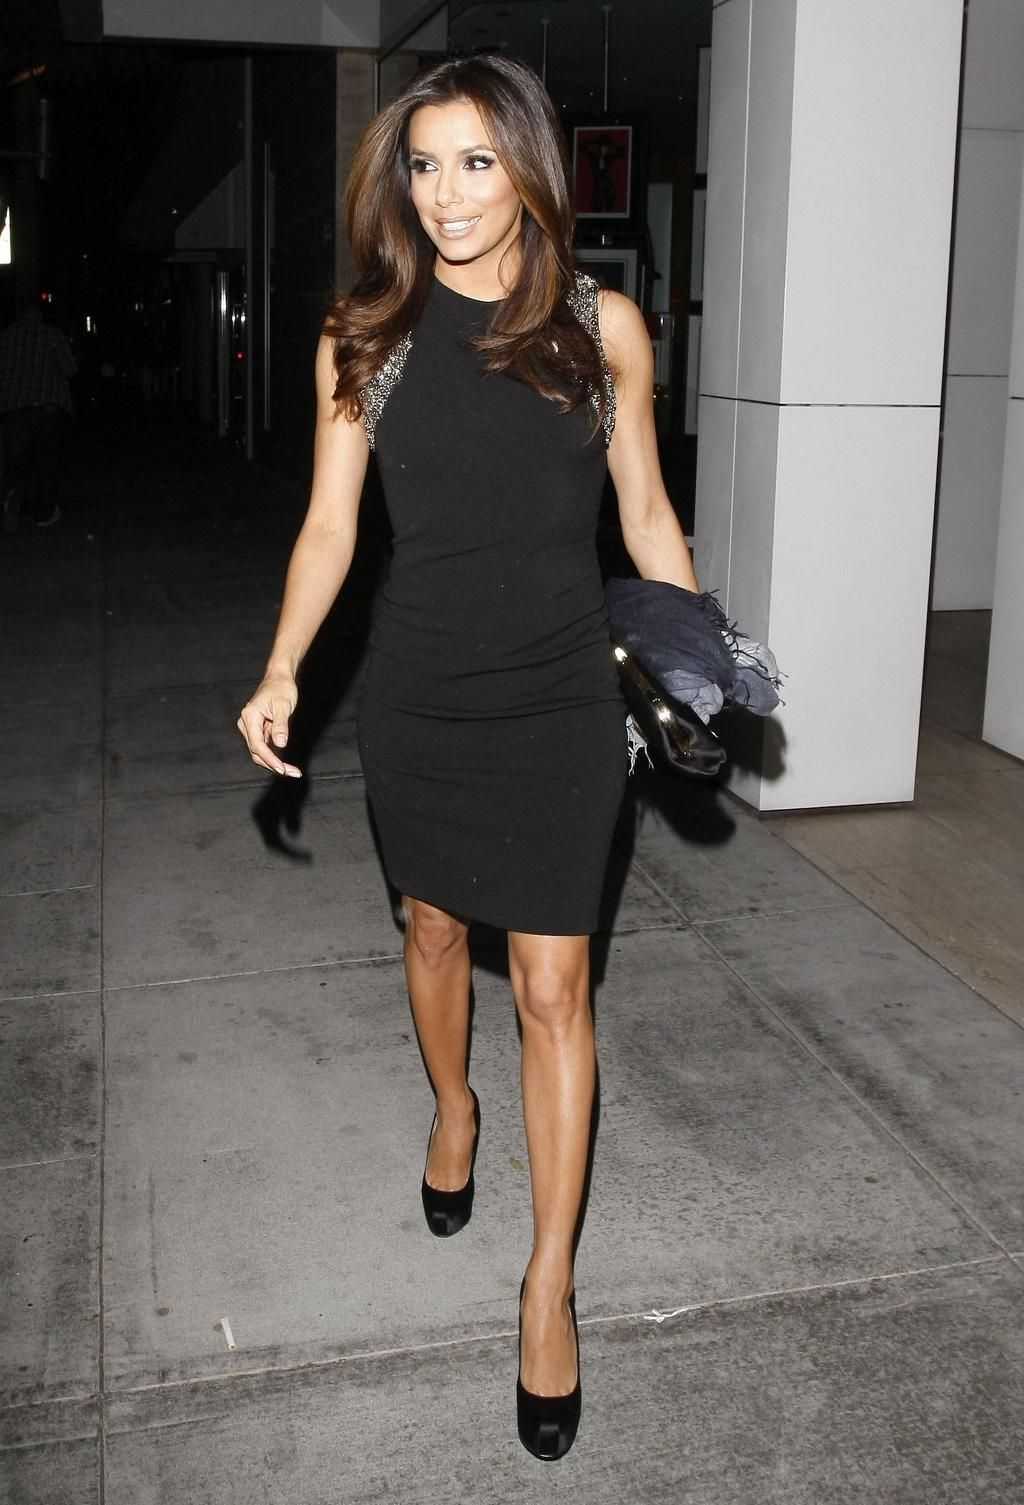 eva longoria style - little black dress #evalongoria #celebrity